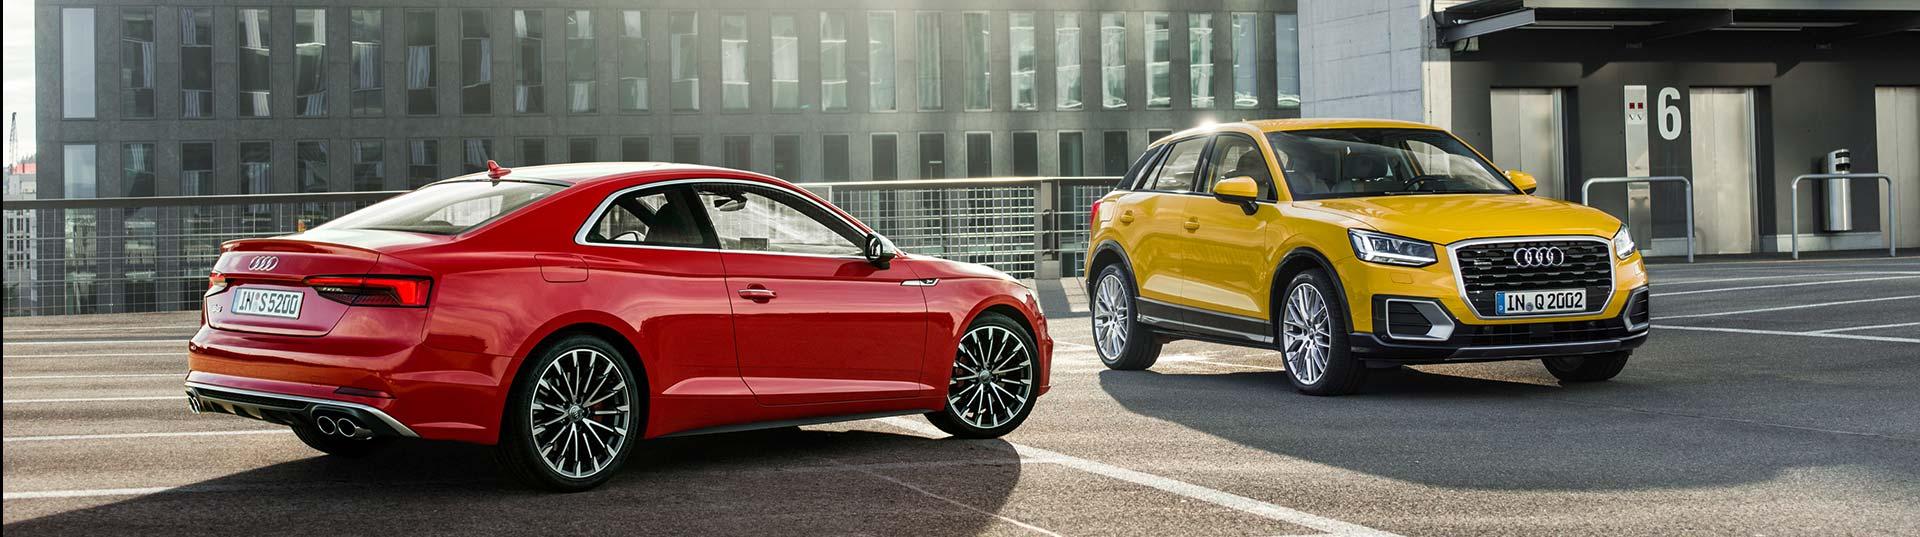 Prémios Audi